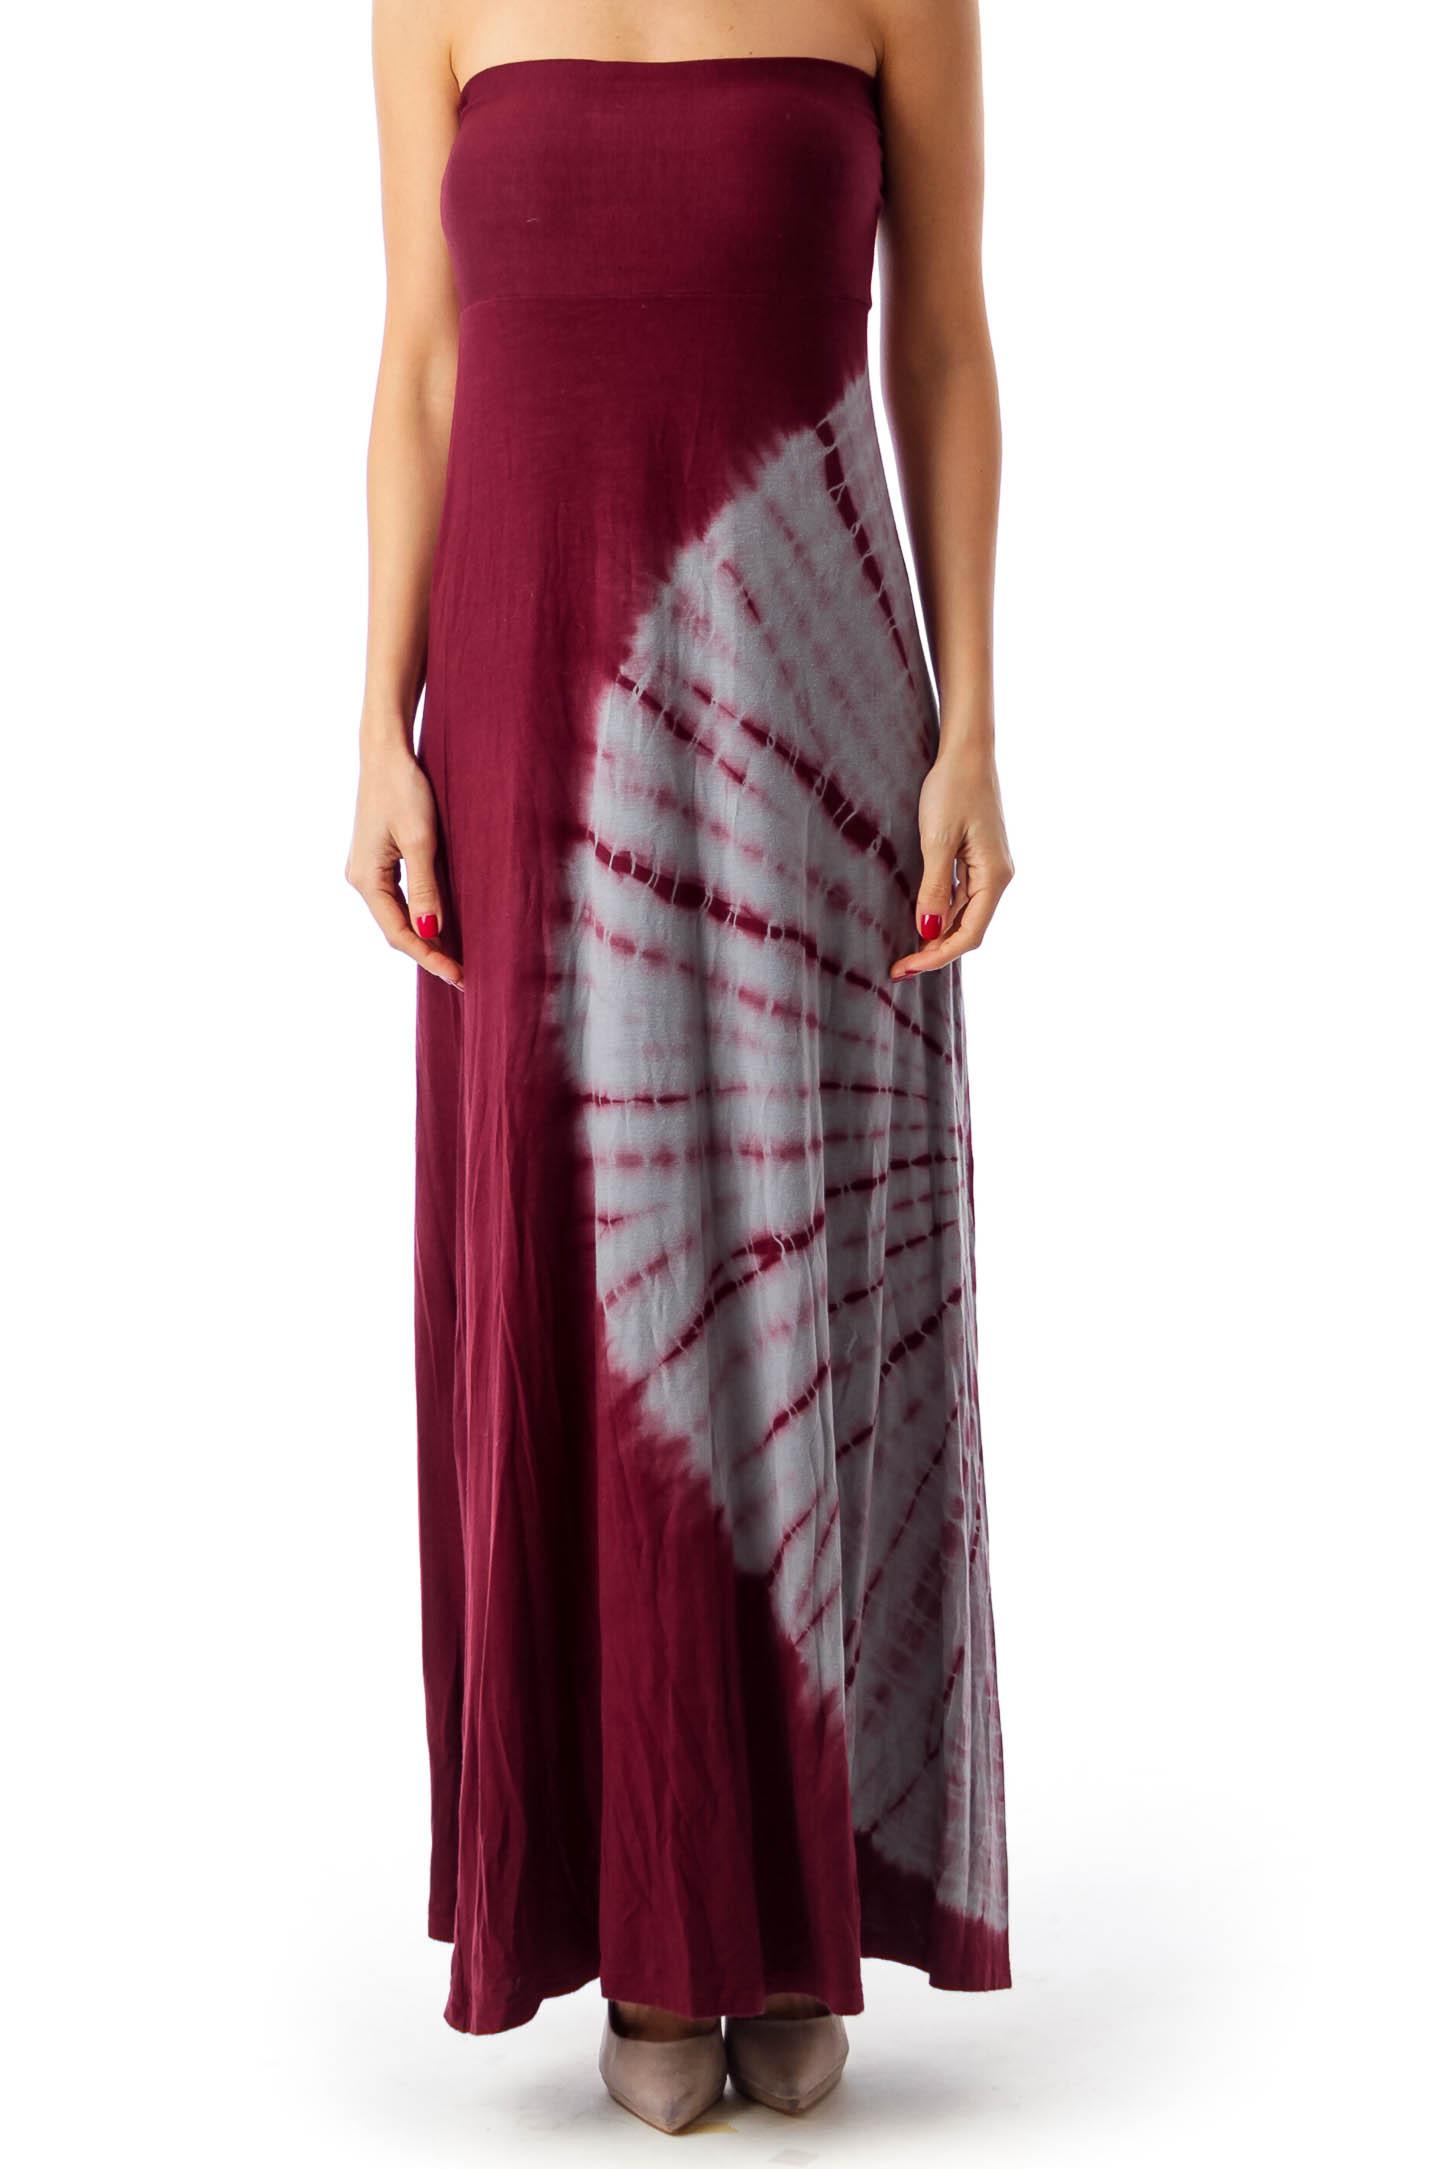 Burgundy & Gray Dyed Maxi Dress